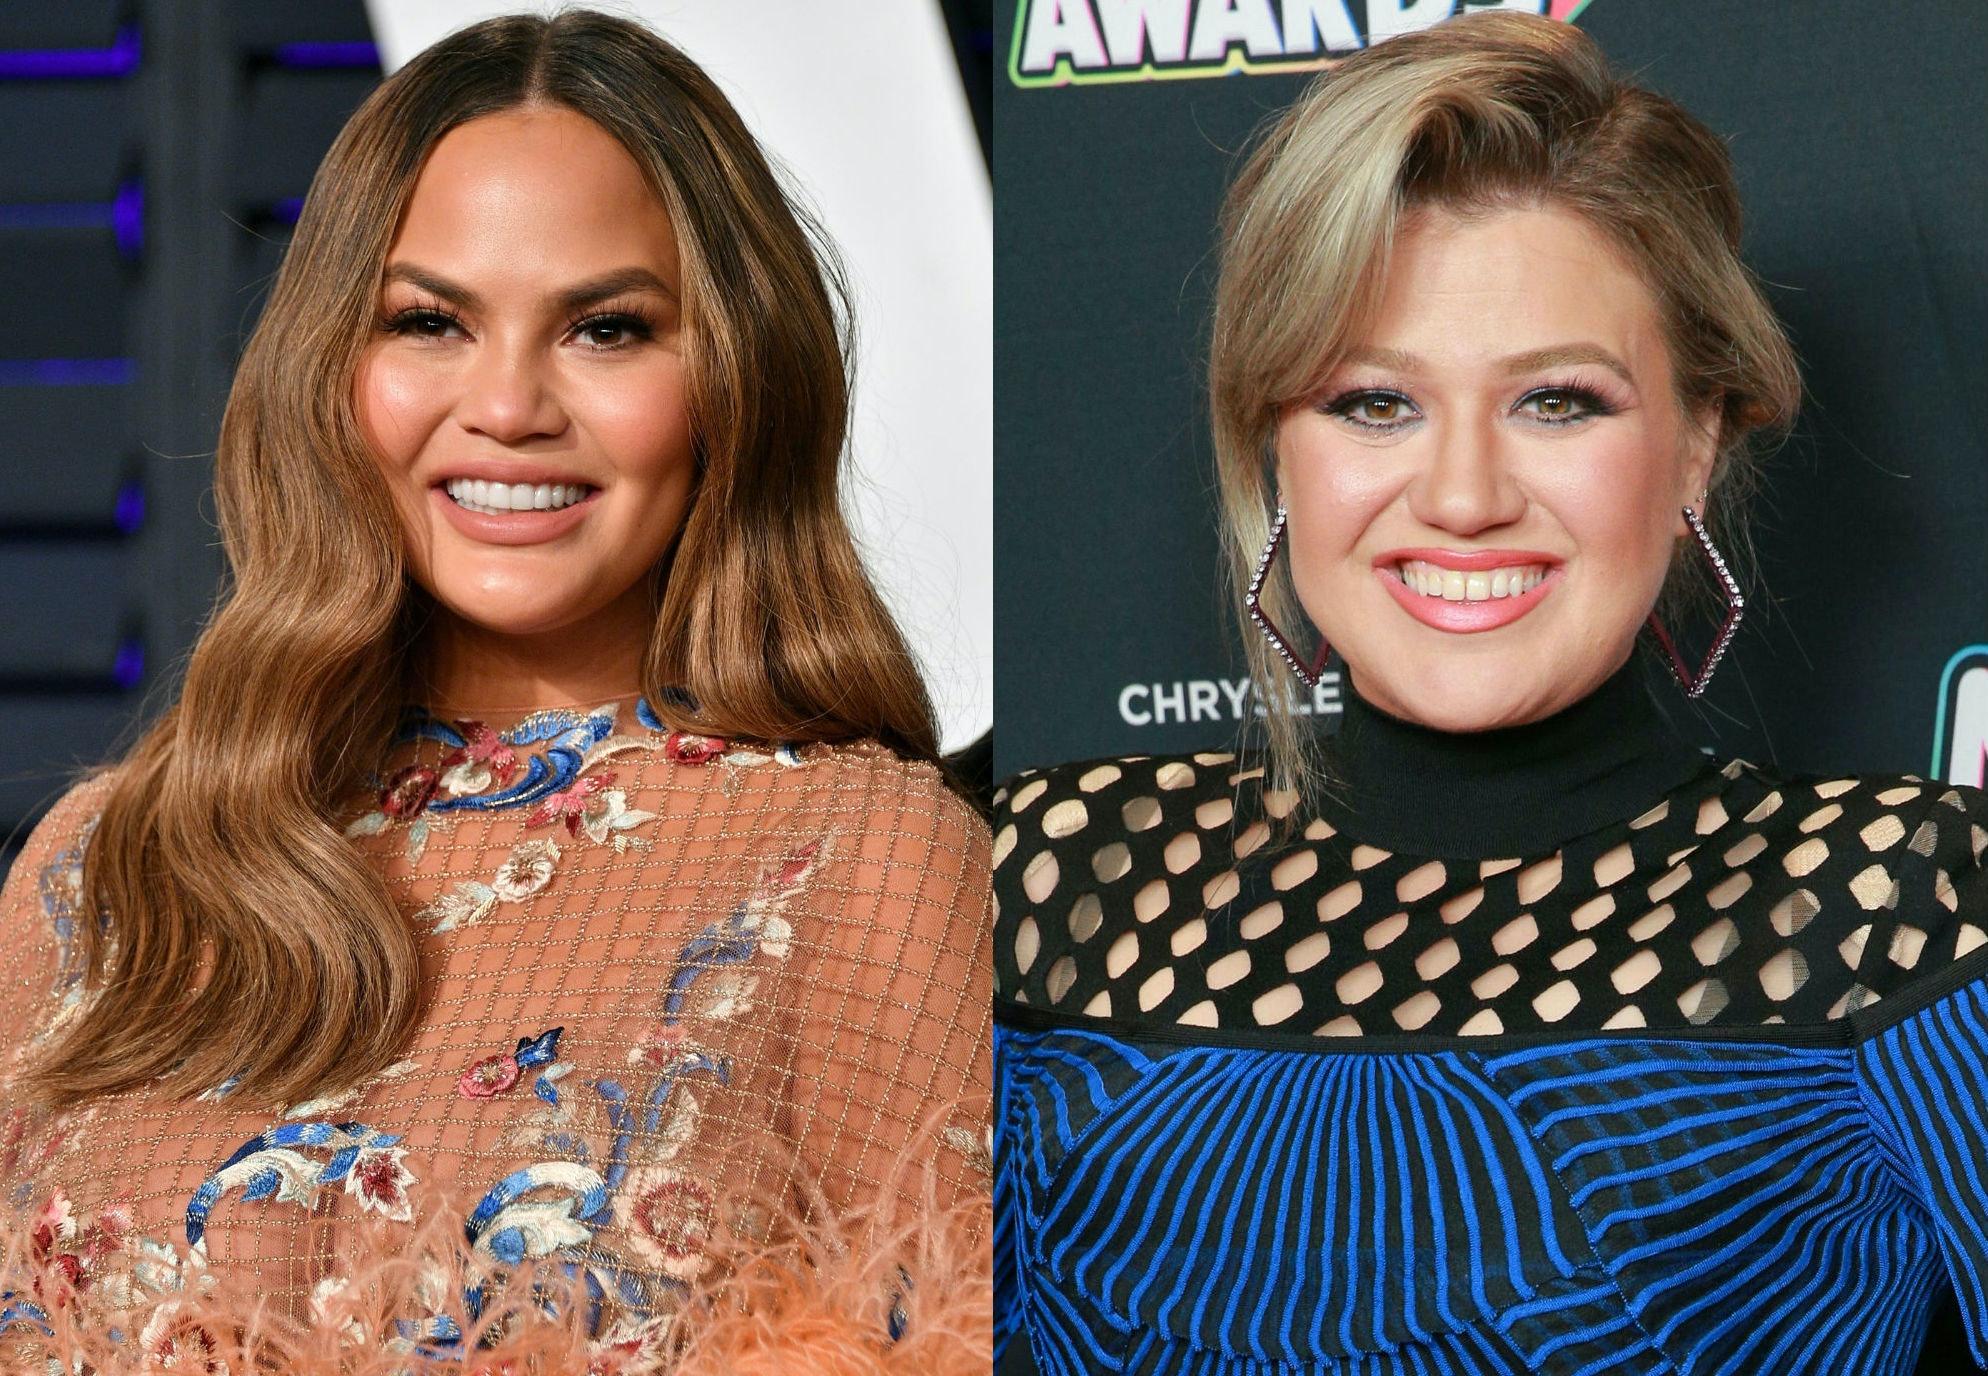 43. Kelly Clarkson 43. Kelly Clarkson new photo